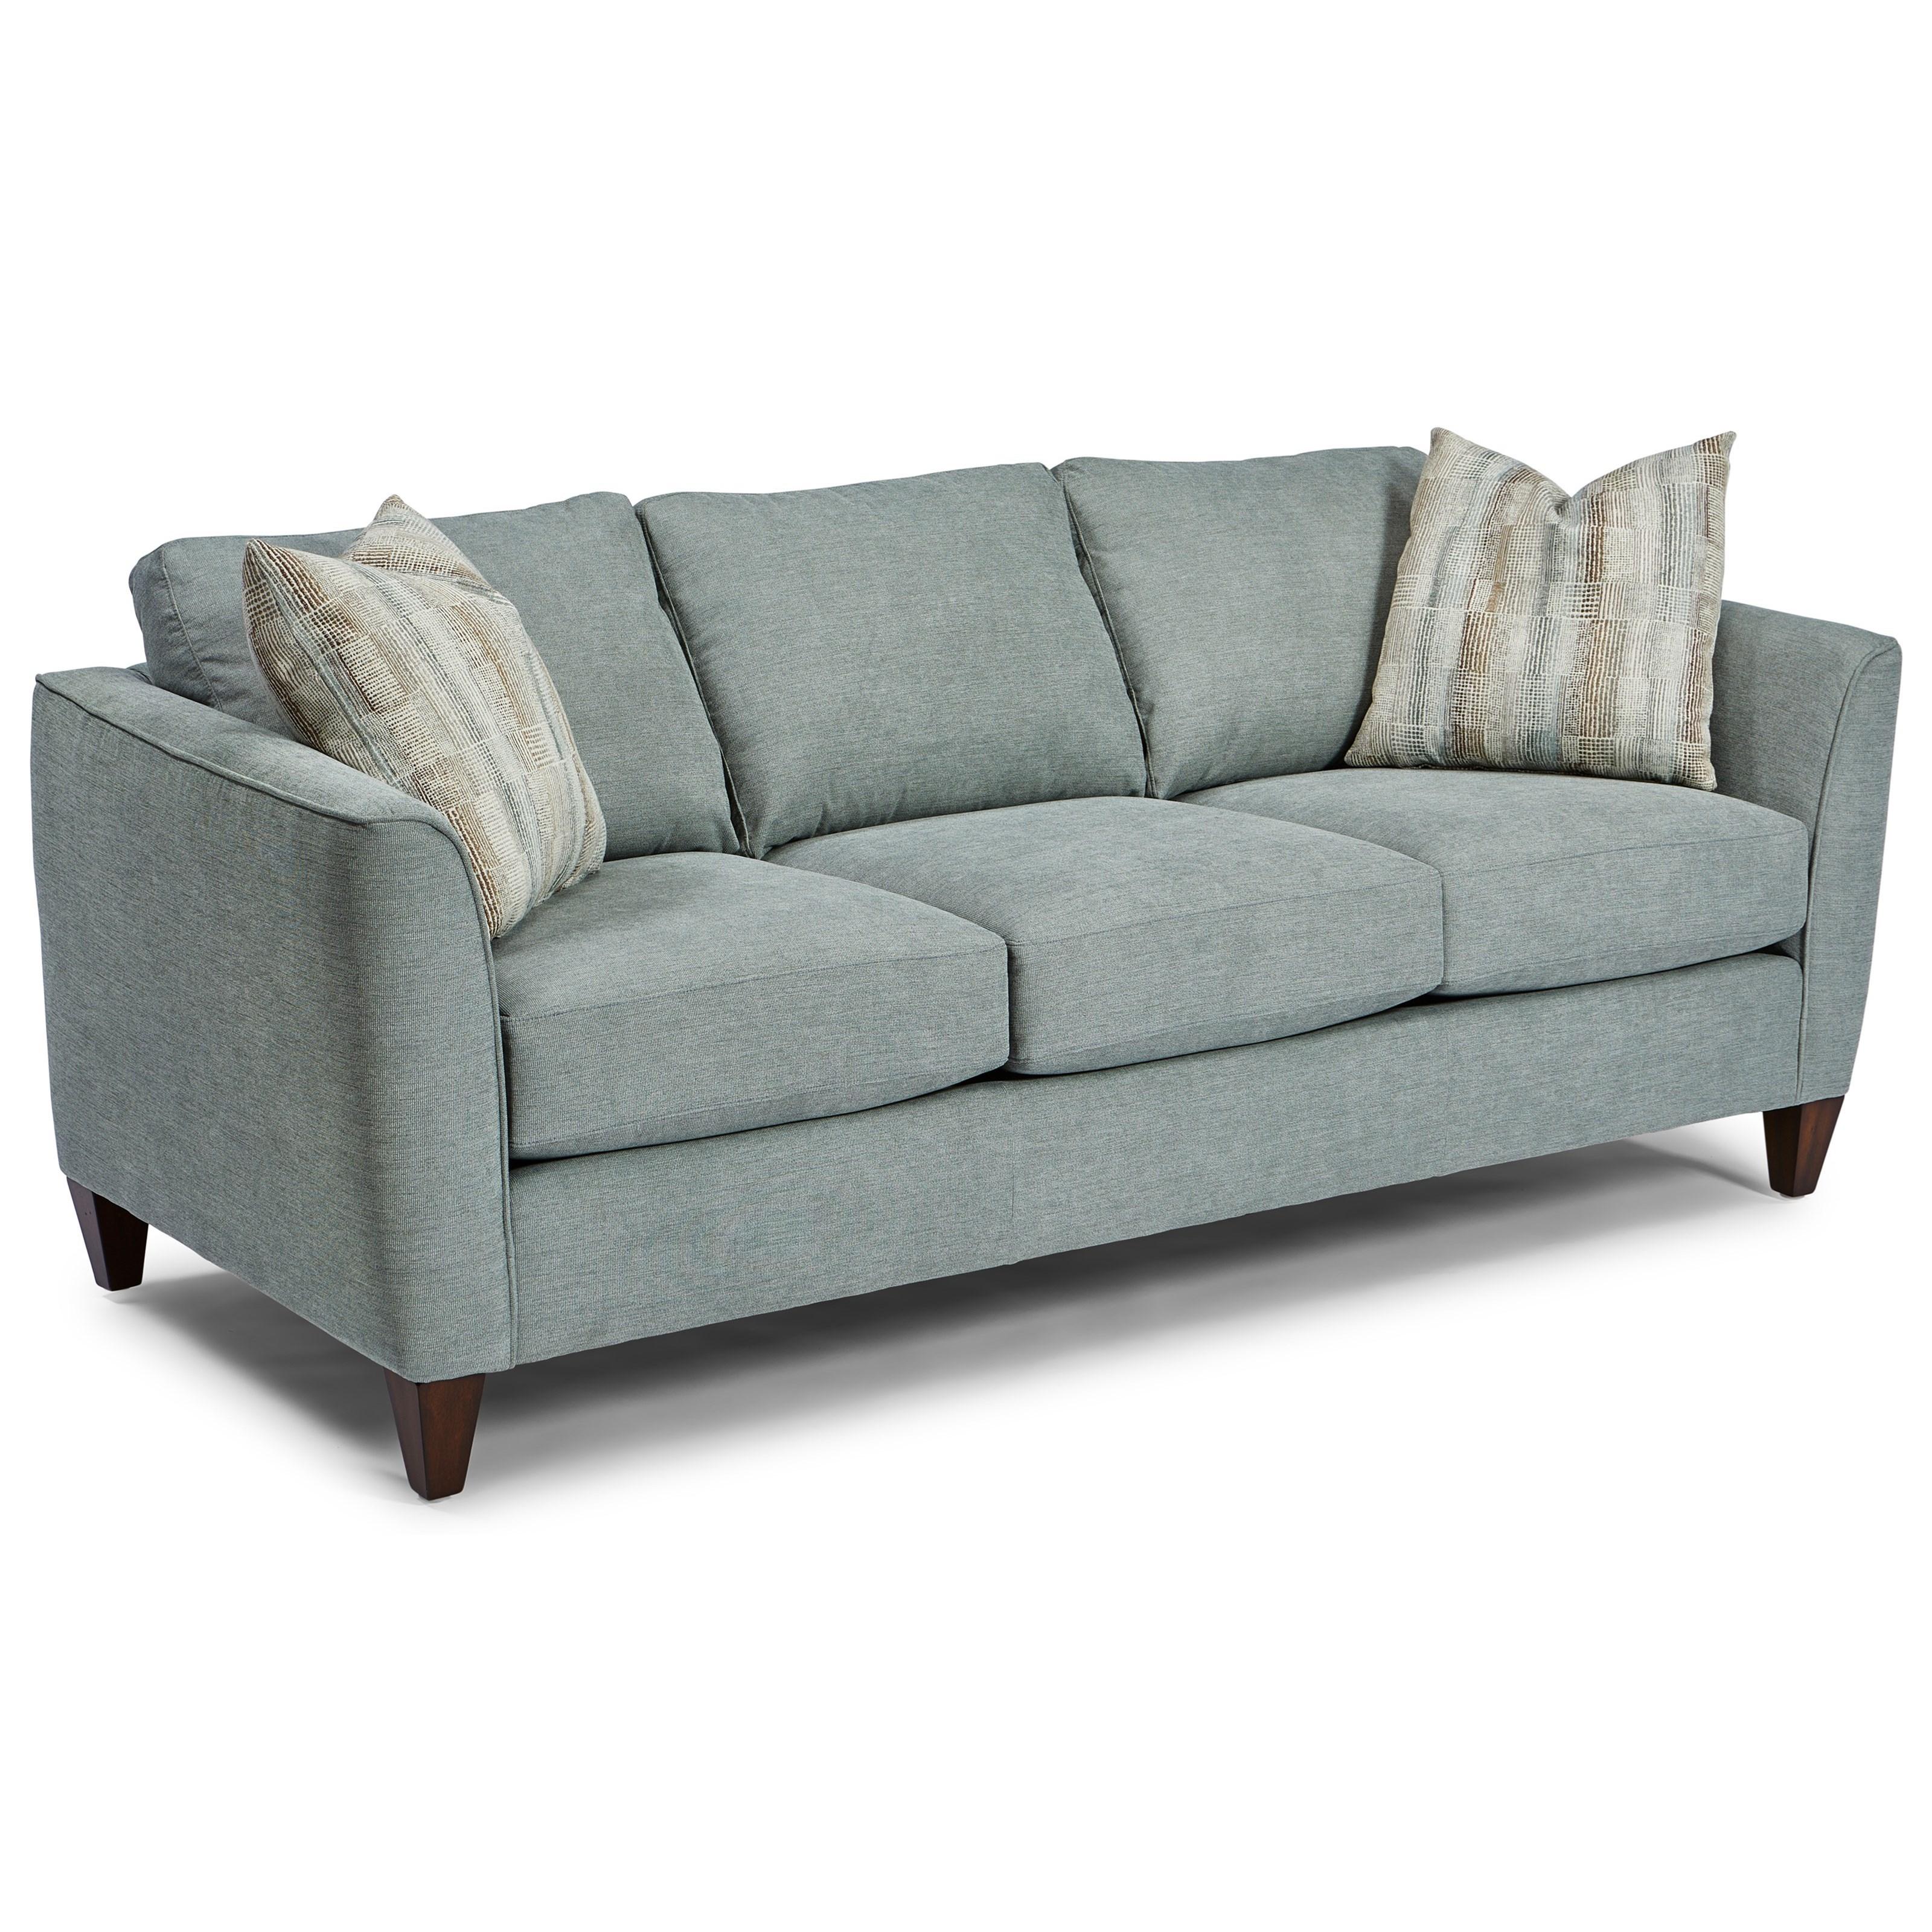 Latitudes - James Sofa  by Flexsteel at Walker's Furniture